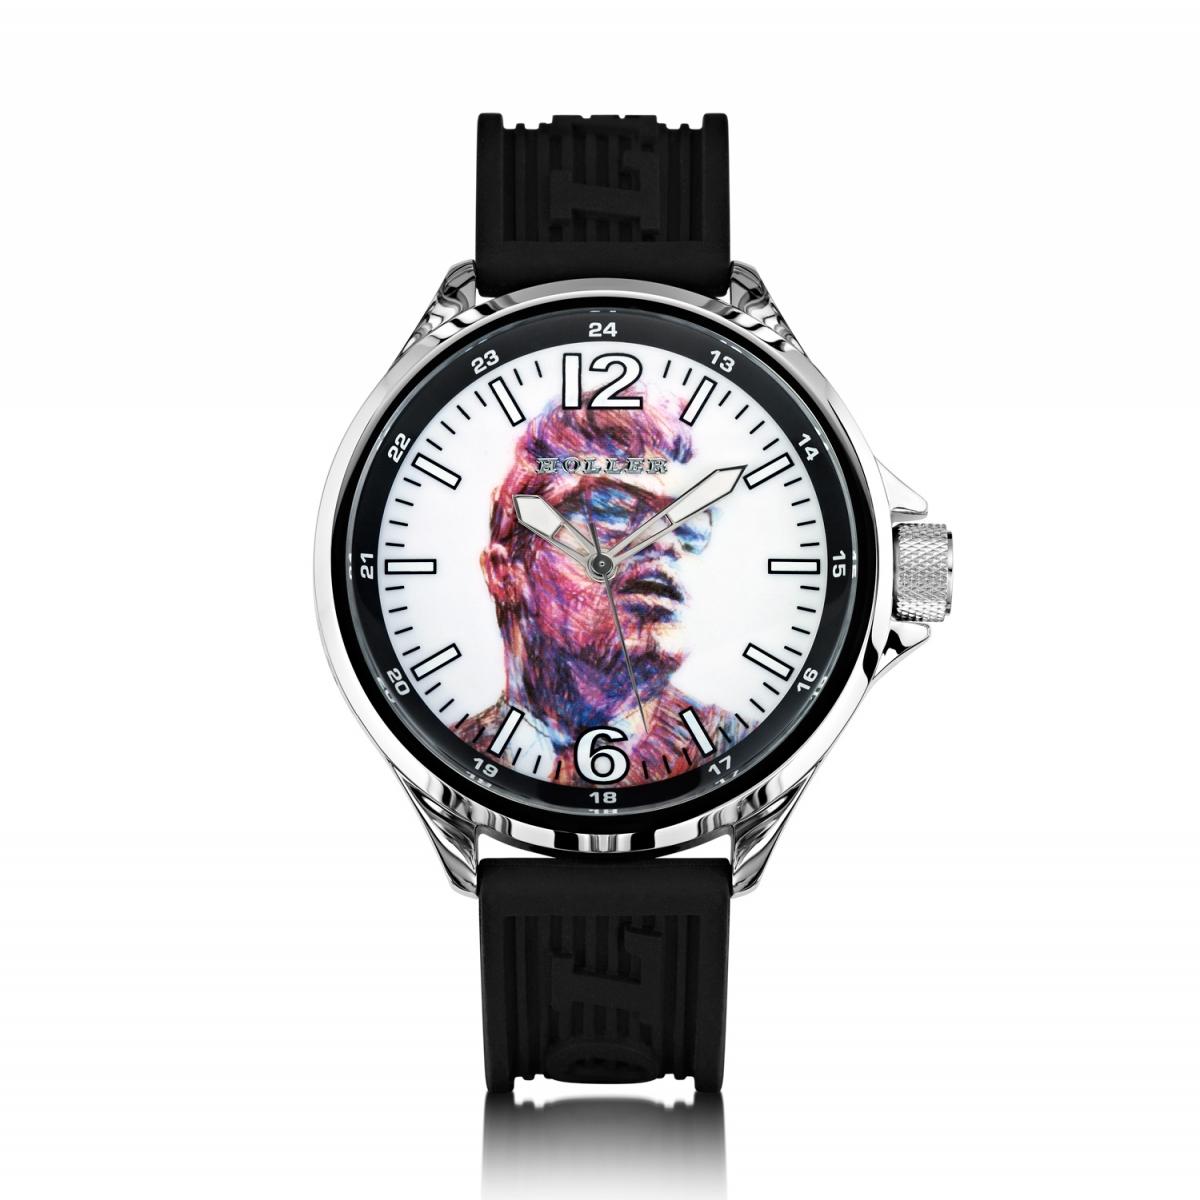 Holler Crazies Walter Watch